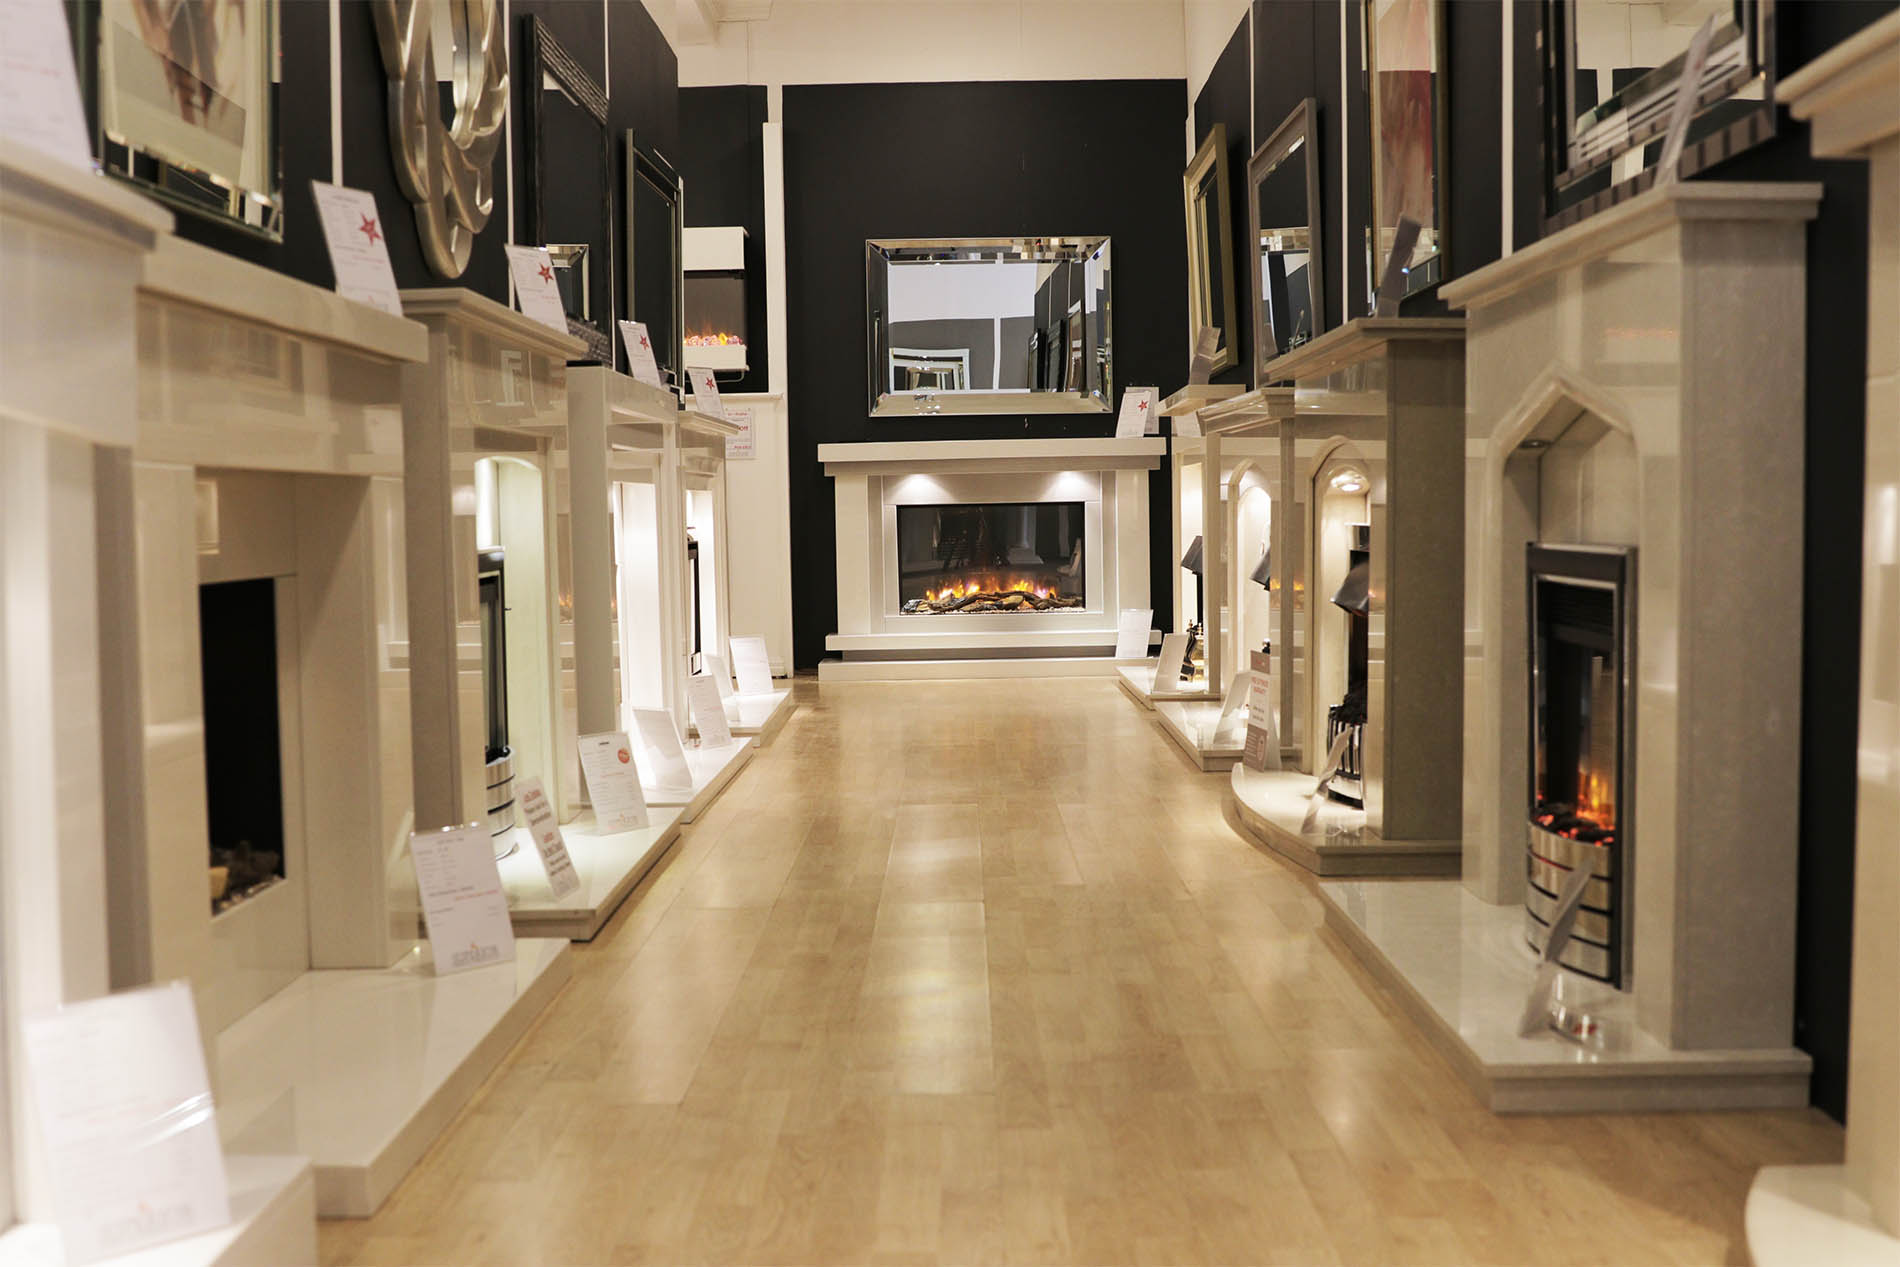 Superior Fireplaces Birmingham Showroom Now Open